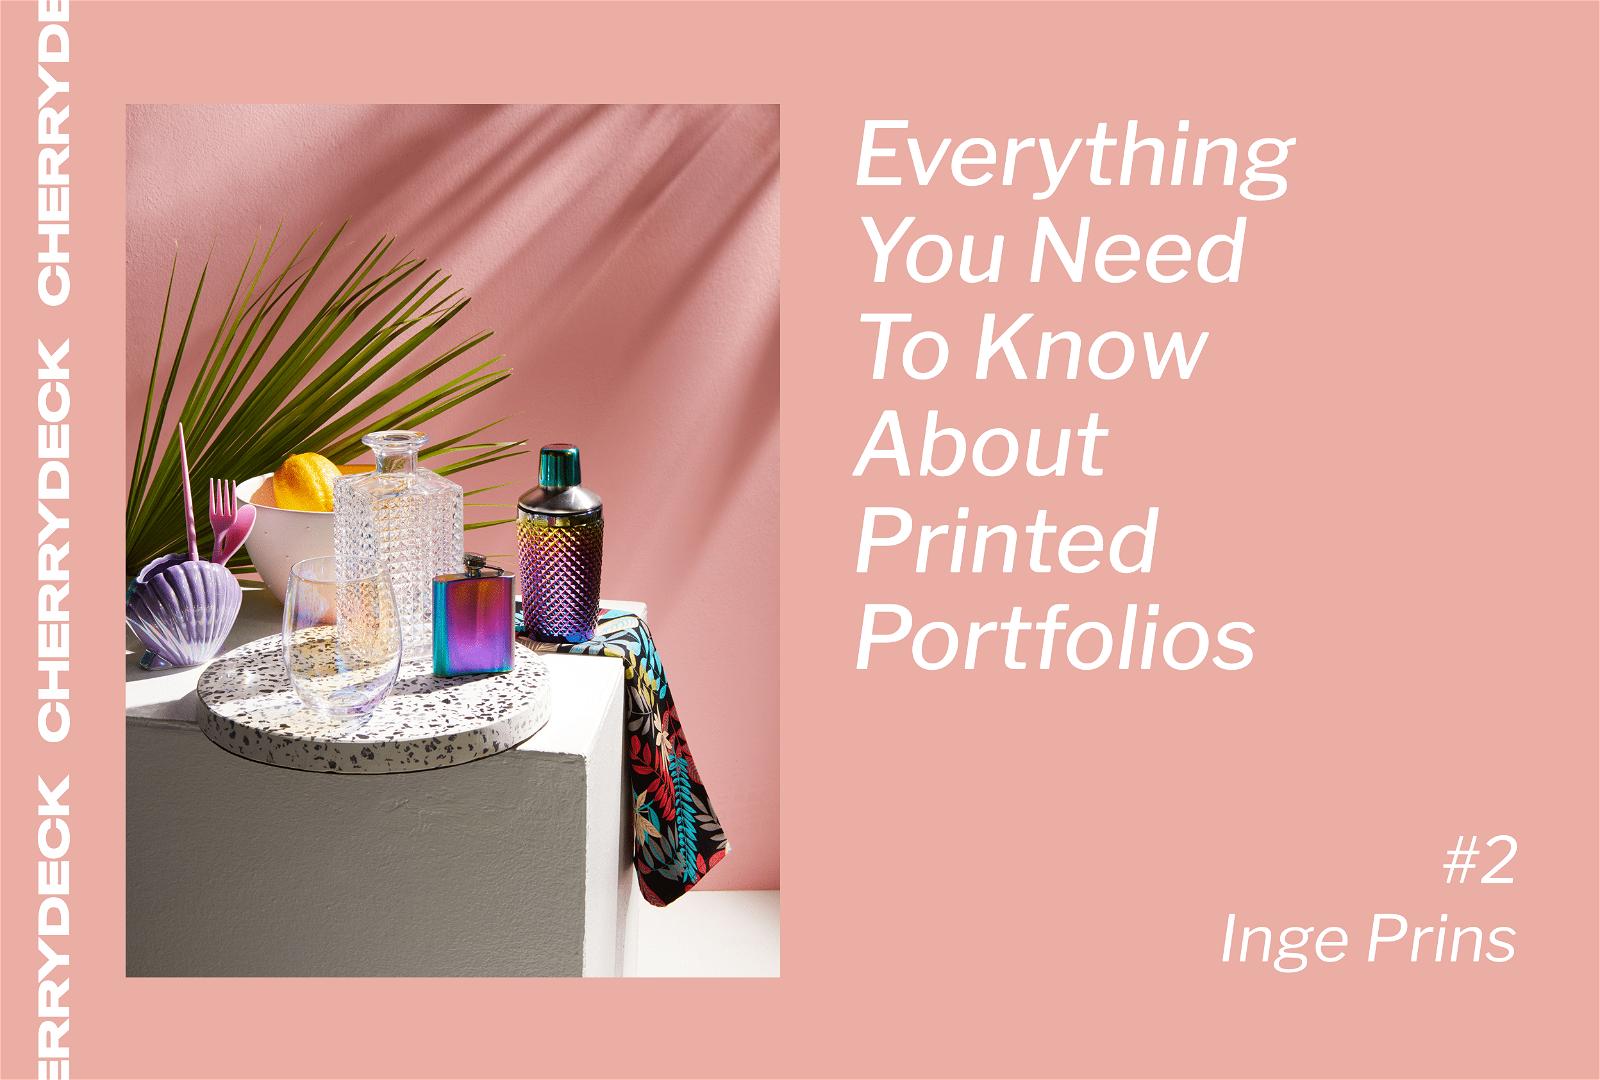 portfolios